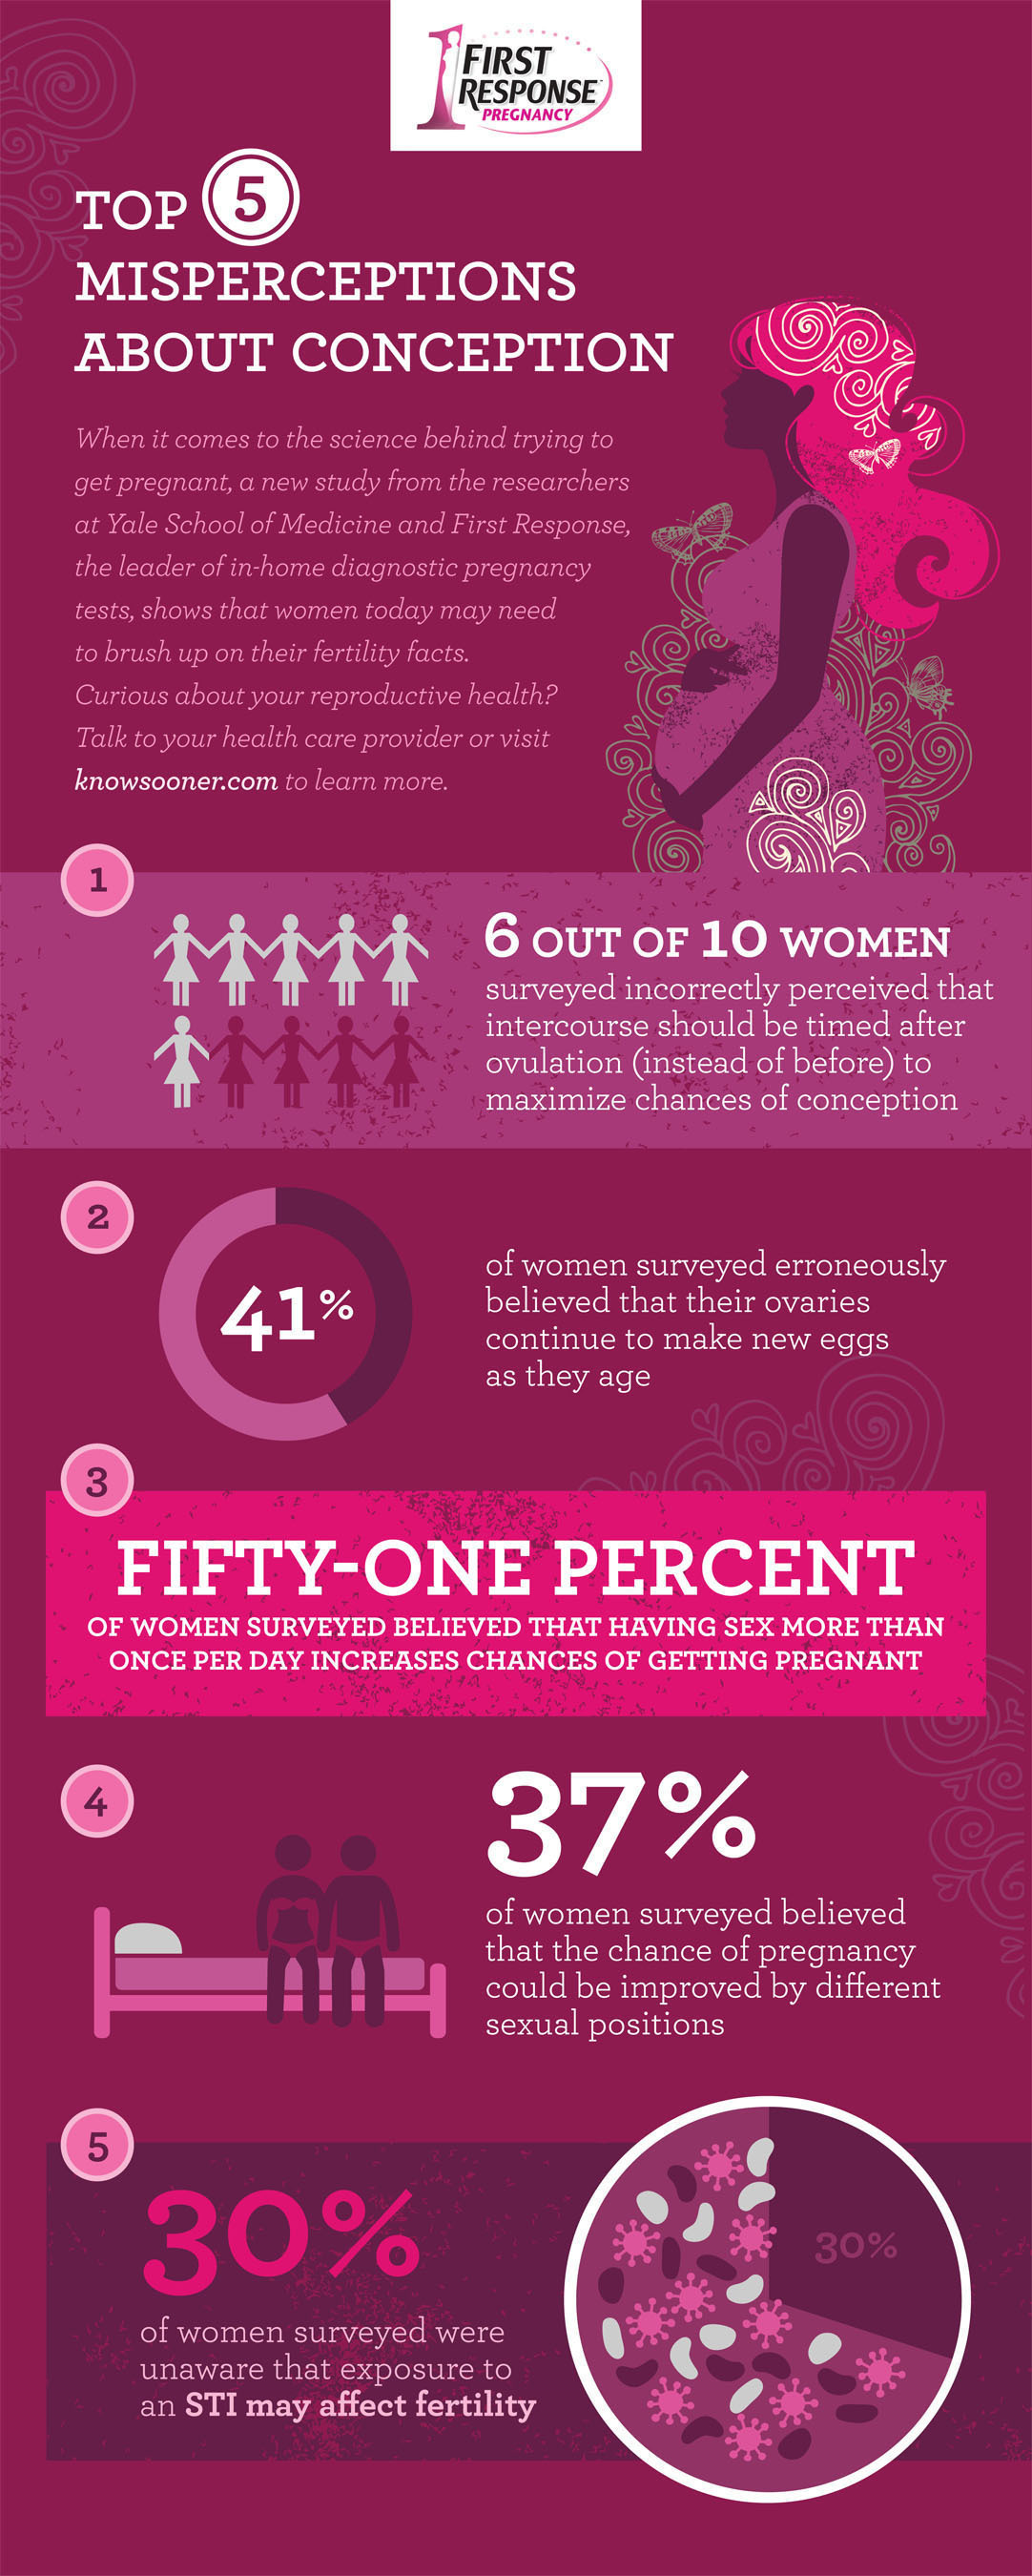 Top 5 Misperceptions About Conception. (PRNewsFoto/FIRST RESPONSE) (PRNewsFoto/FIRST RESPONSE)